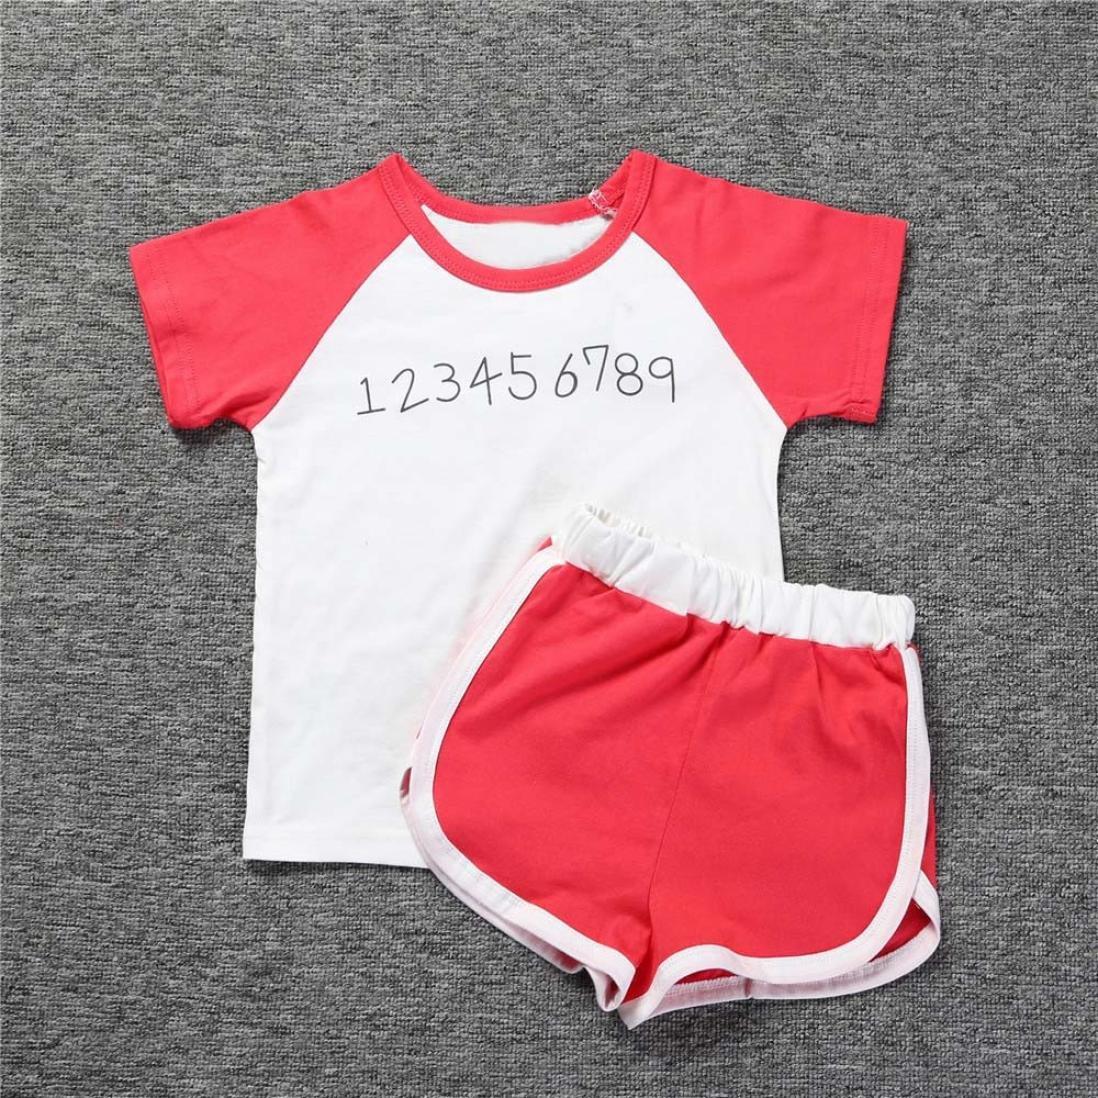 Baby Girl Boy Clothes,Efaster Toddler Kid Boys Girls Print T-shirt PP Shorts Set